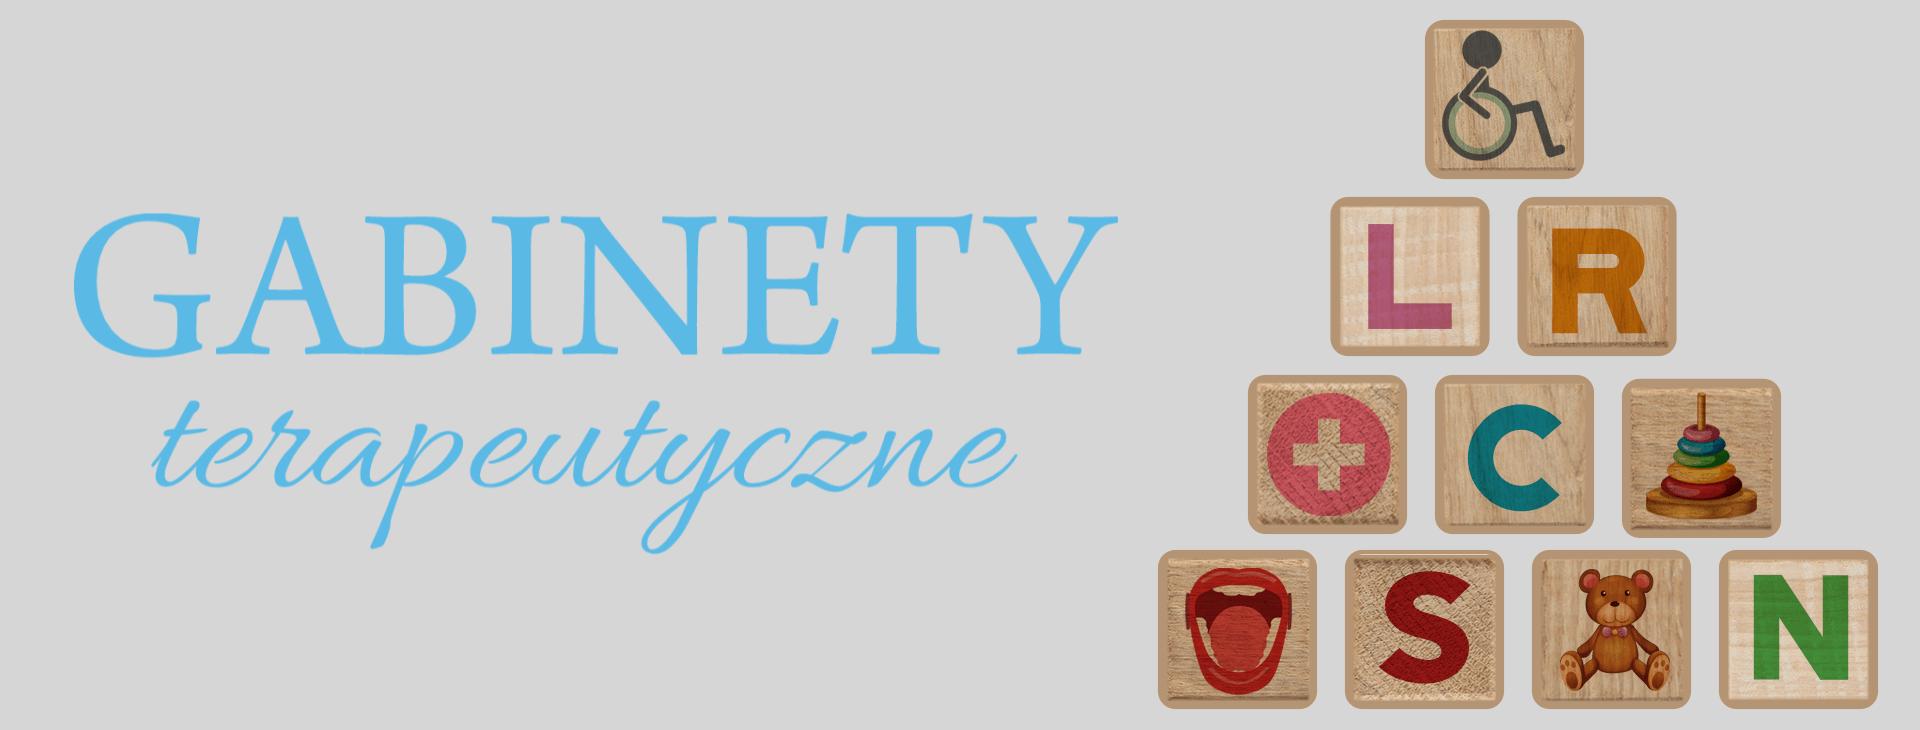 Gabinety_terapeutyczne_Desktop